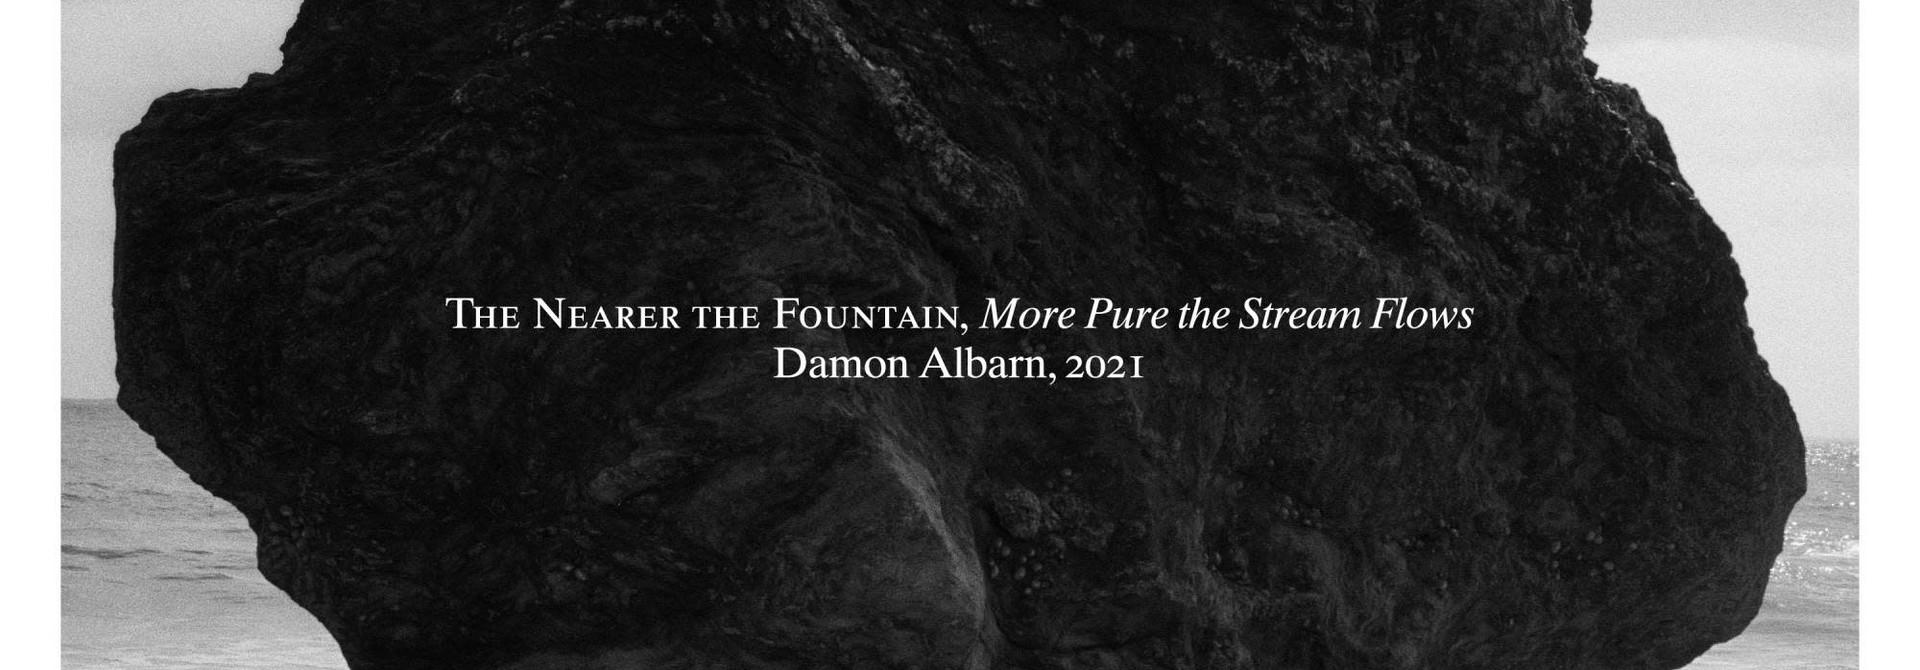 Damon Albarn • The Nearer The Fountain, More Pure The Stream Flows (PRÉCOMMANDE)